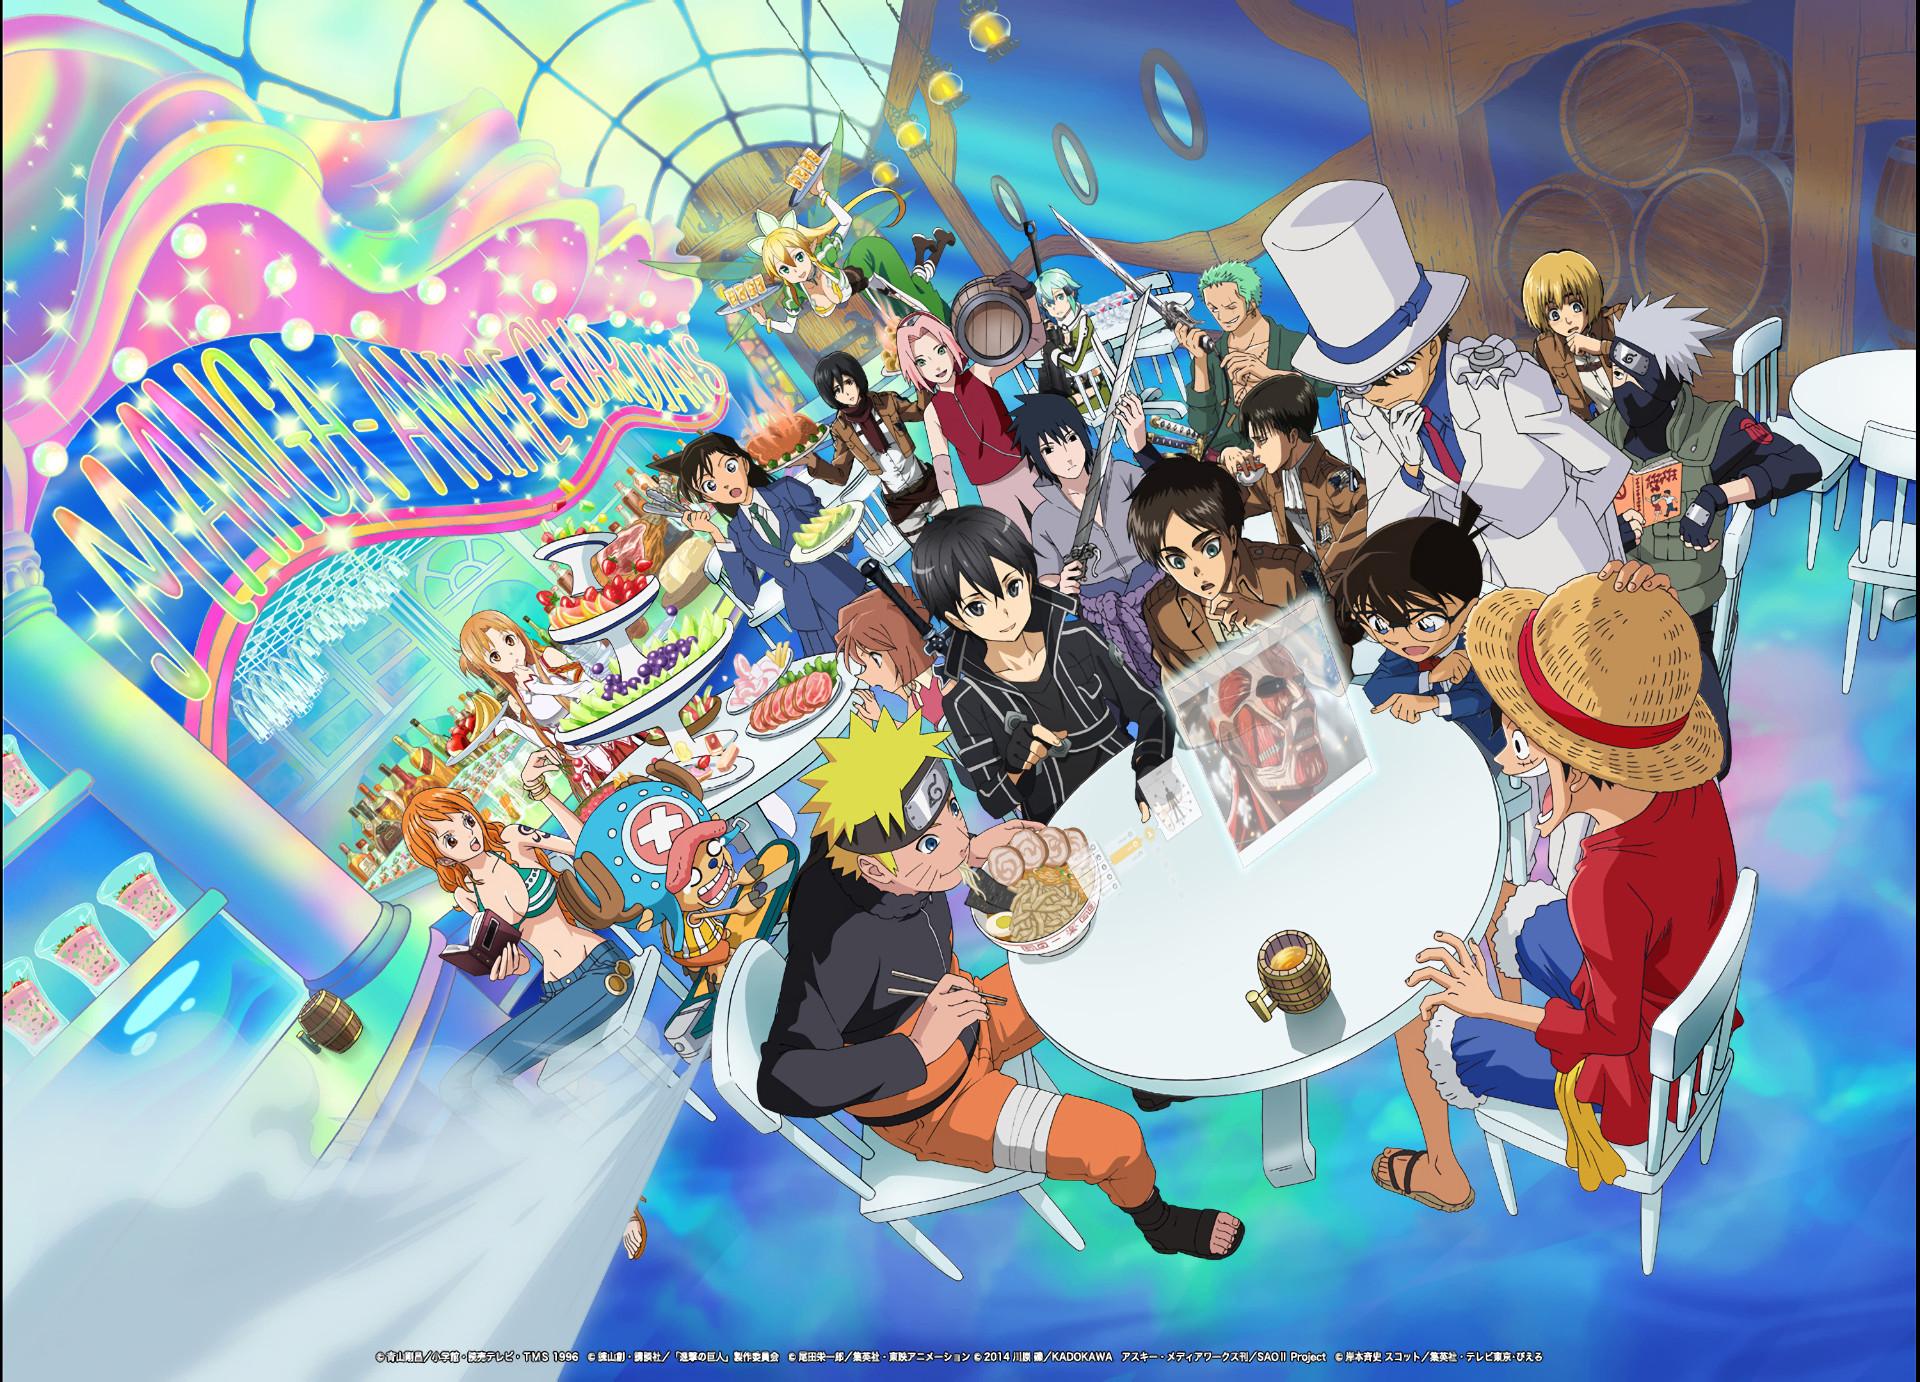 Anime – Crossover Naruto Uzumaki Monkey D. Luffy Kazuto Kirigaya Sakura  Haruno Mikasa Ackerman Armin